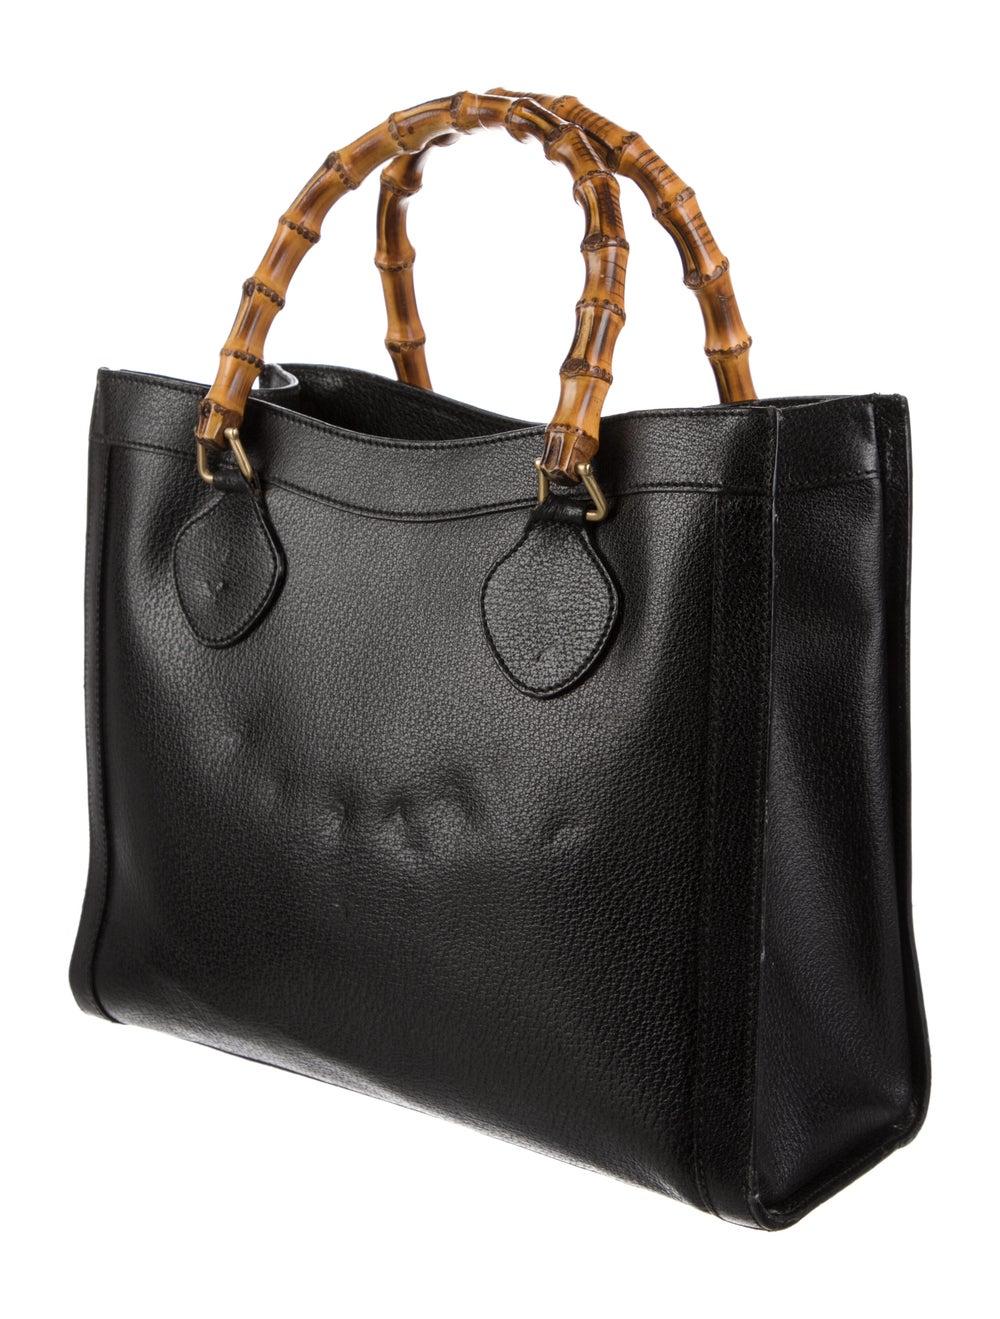 Gucci Vintage Diana Bamboo Tote Black - image 3